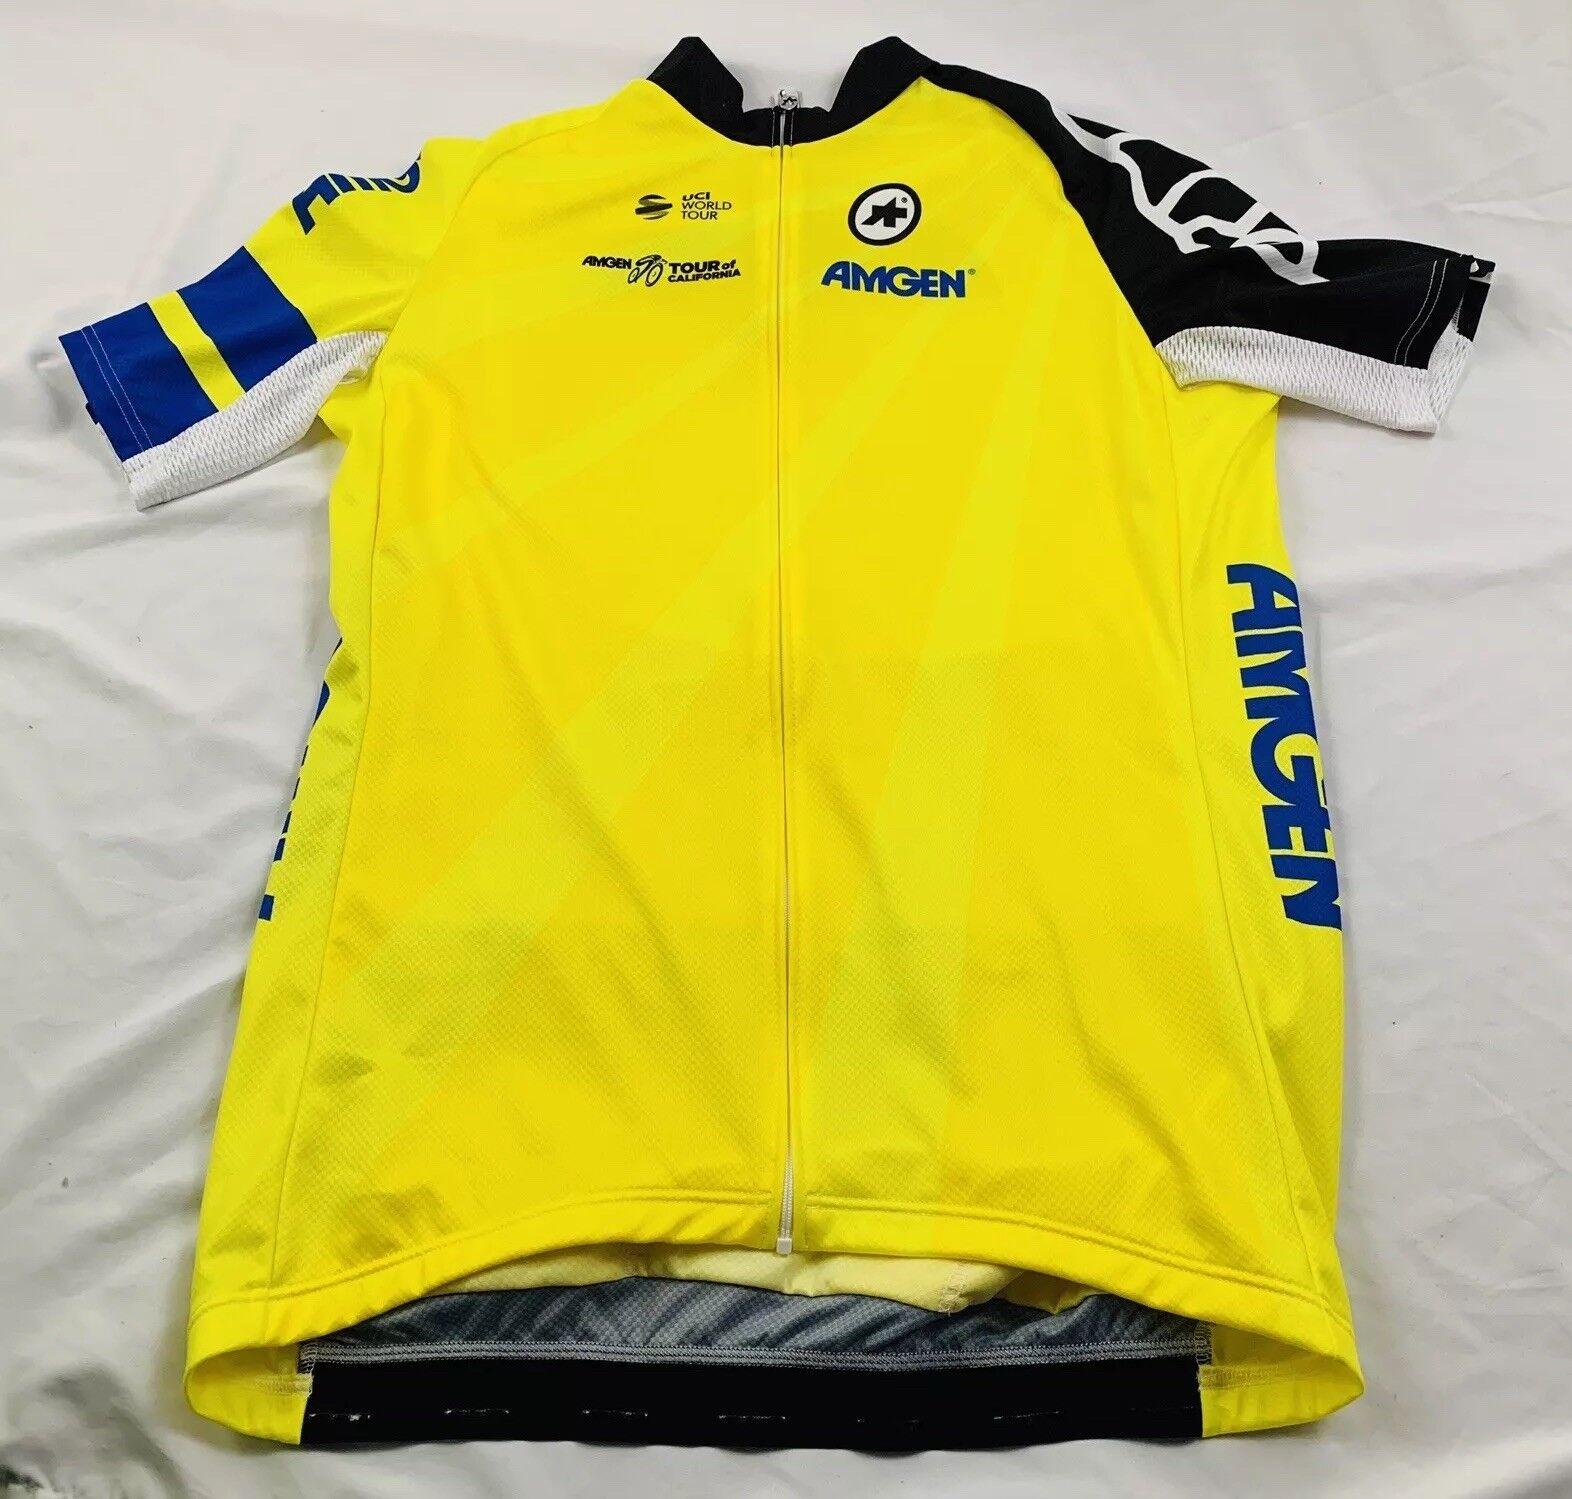 Assos Amgen Tour of California Leaders Yellow Jersey Full Zip